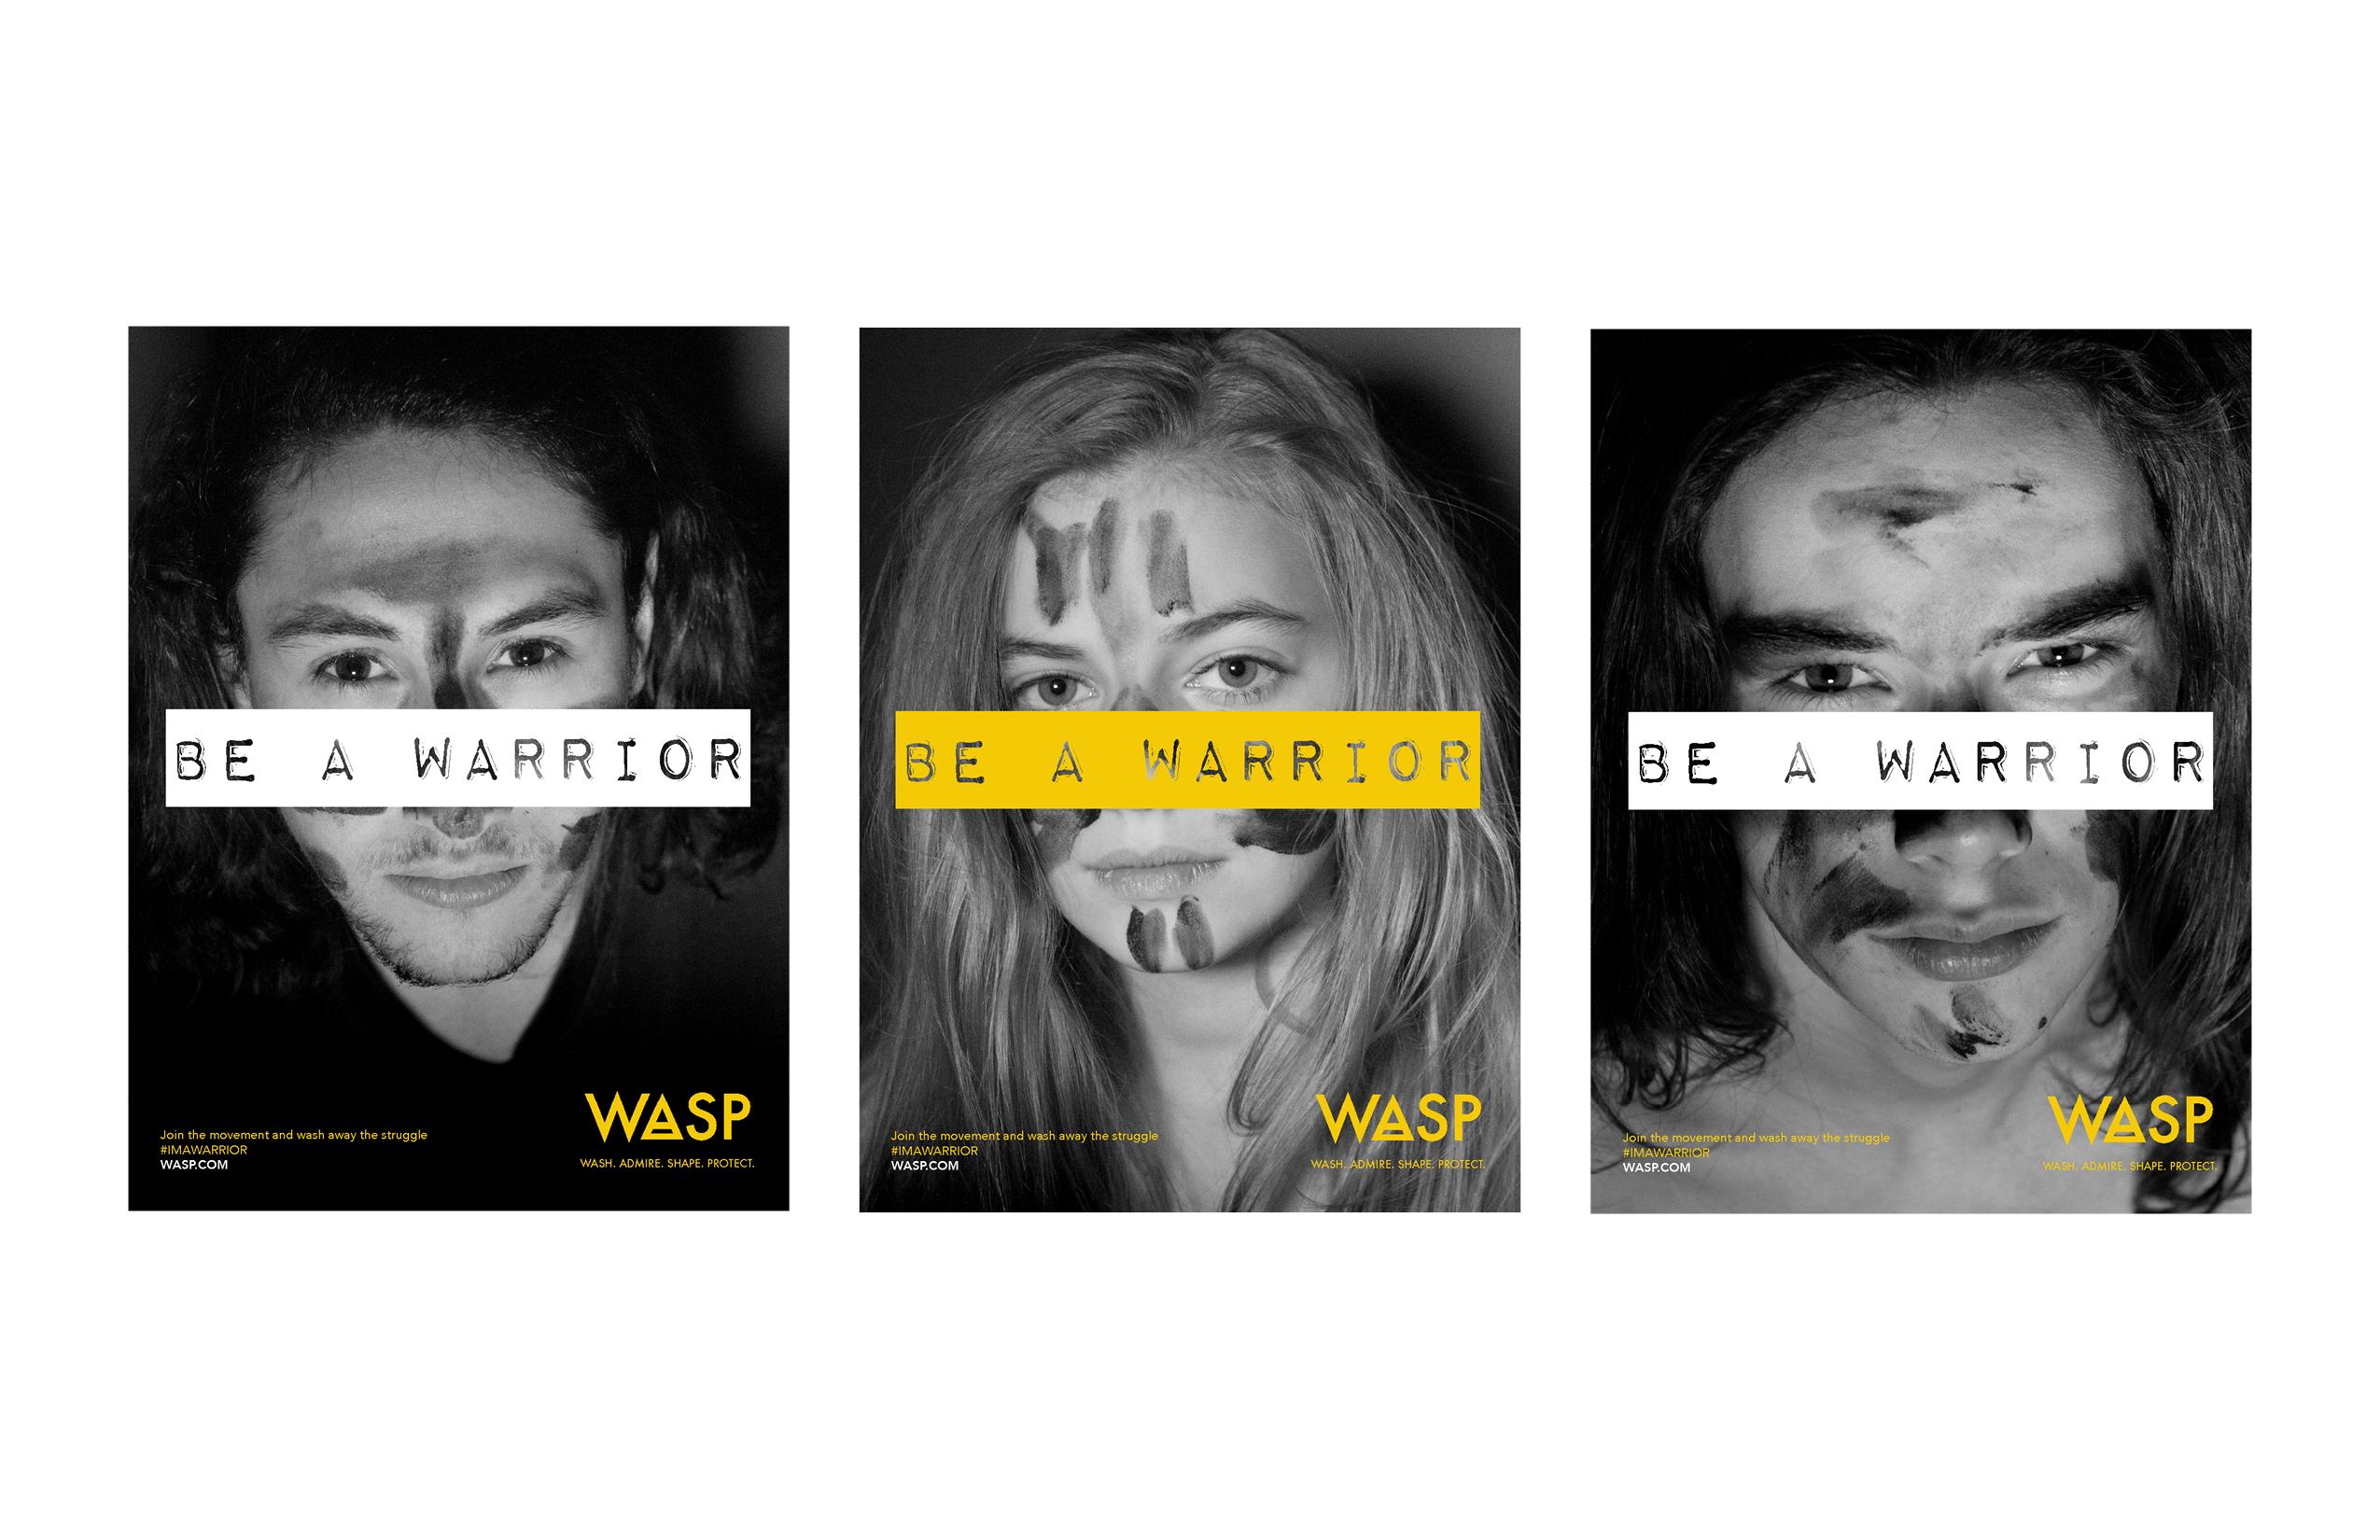 WASP Ads